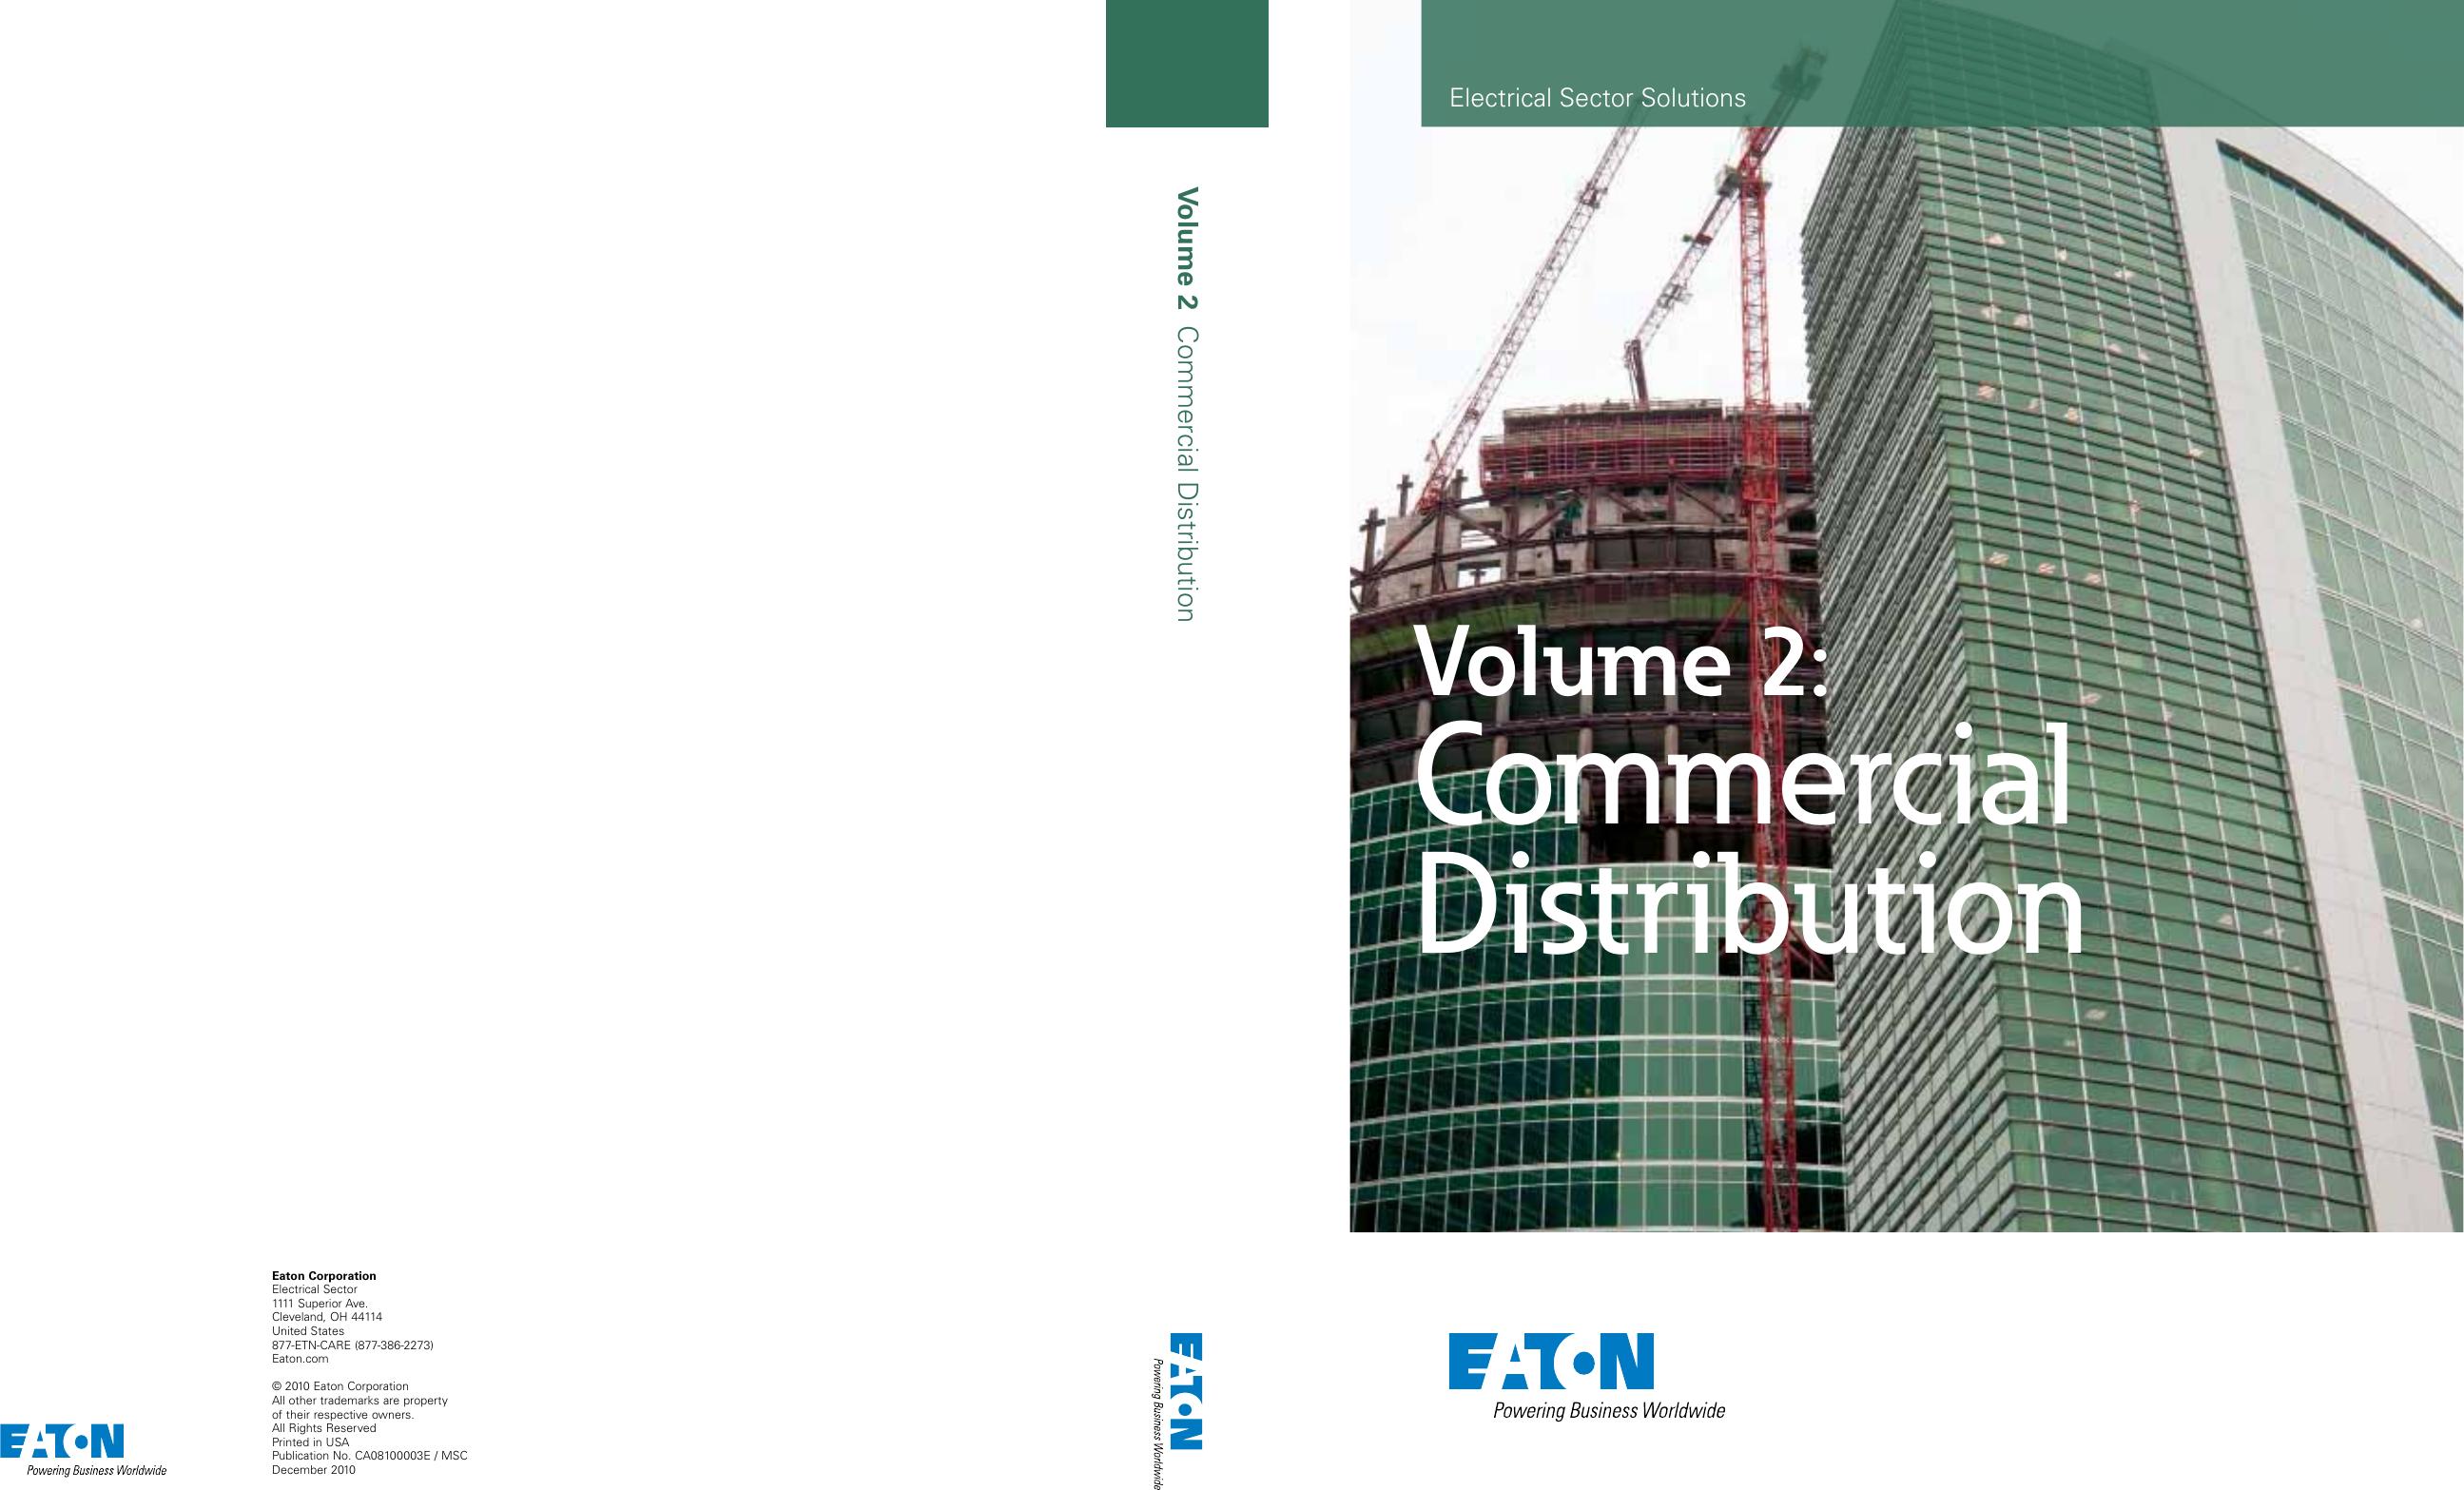 Cutler Hammer Transformer V48m28t22ee Wiring Diagram Schematic Volume 02 Commercial Distribution Eaton